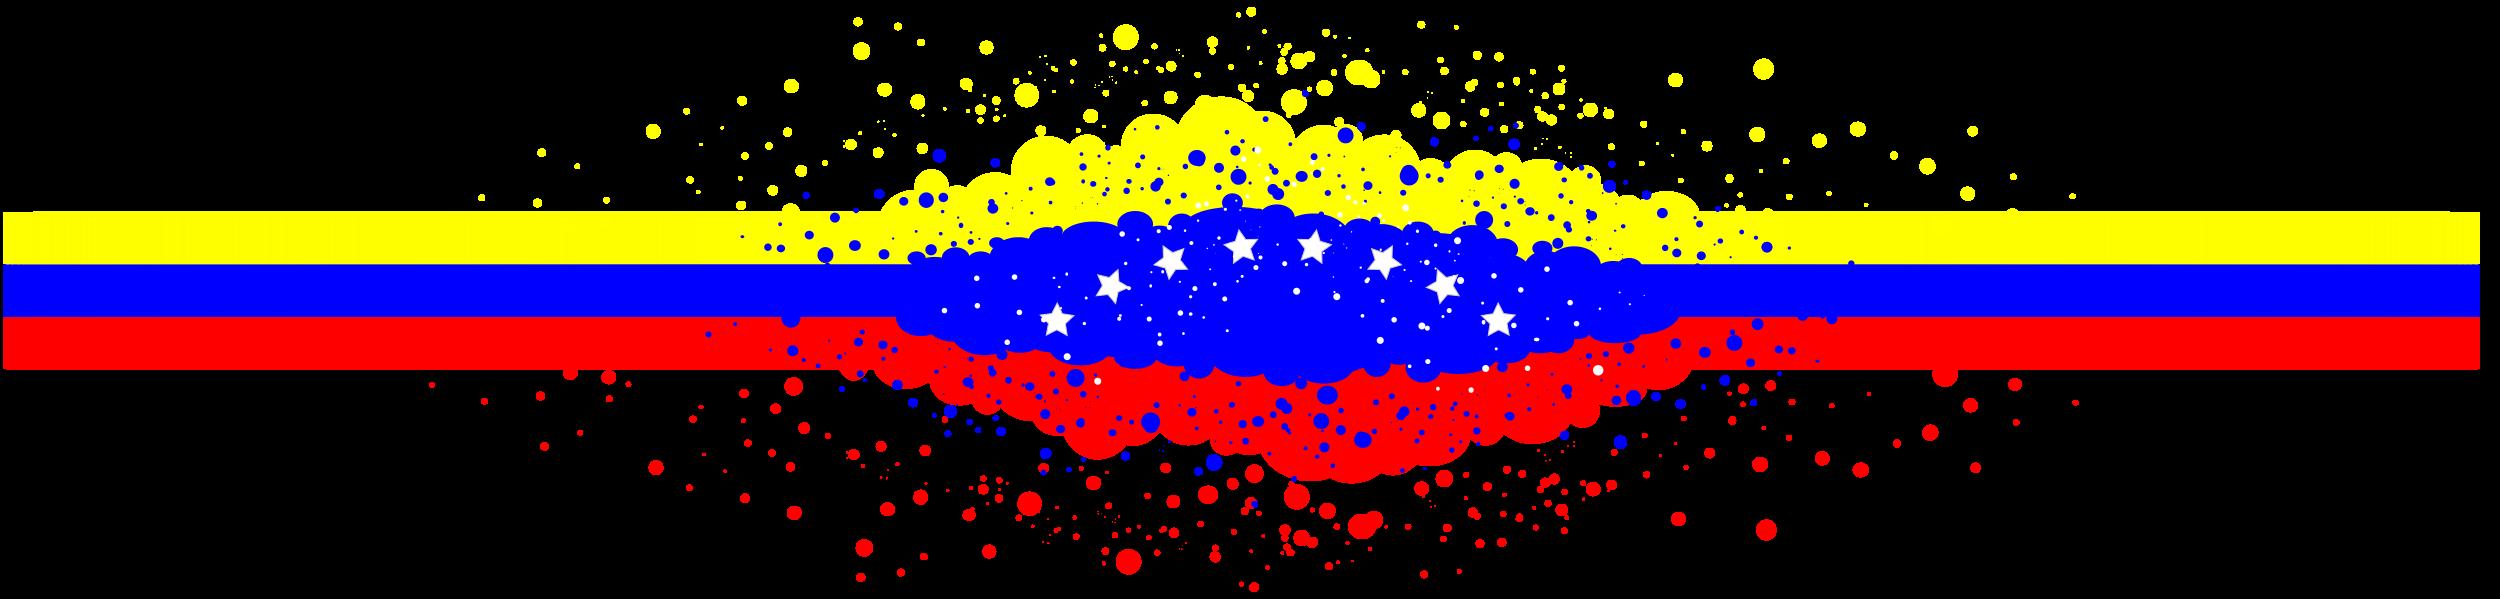 Pin By Jeny Chique On Bandera De Venezuela Artwork Abstract Abstract Artwork